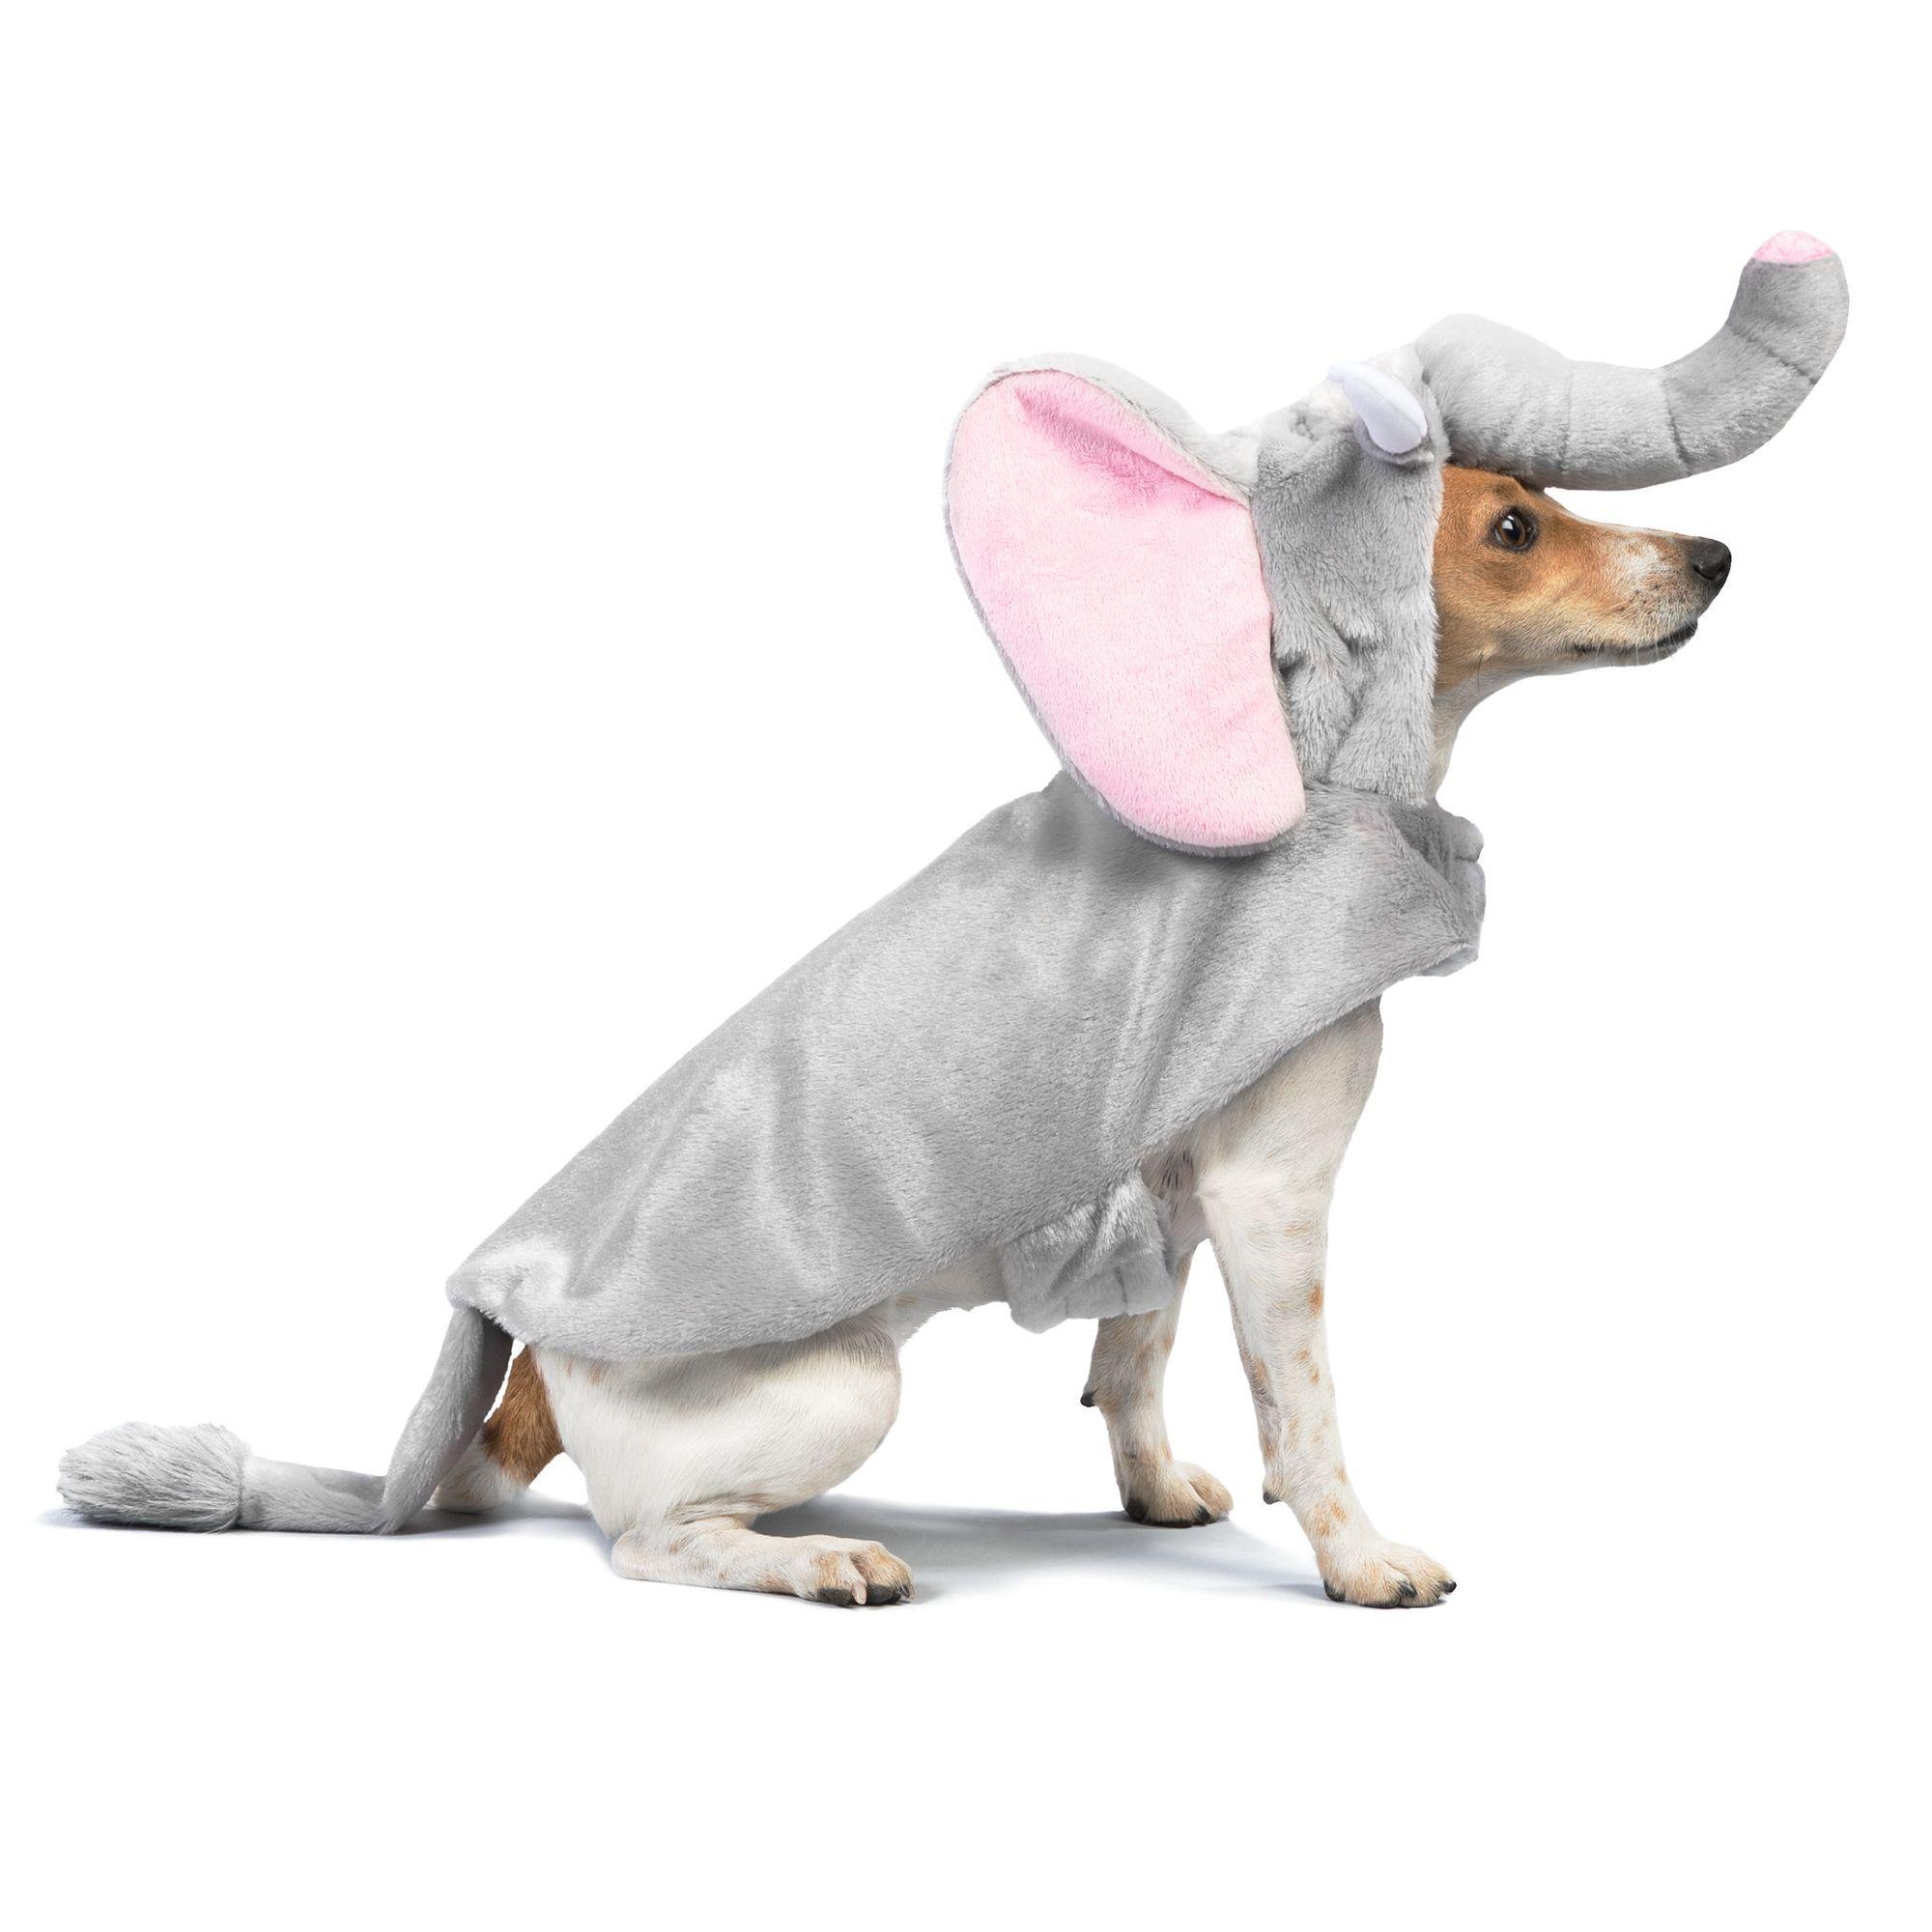 Thrills And Chills Halloween Elephant Pet Costume Size Medium